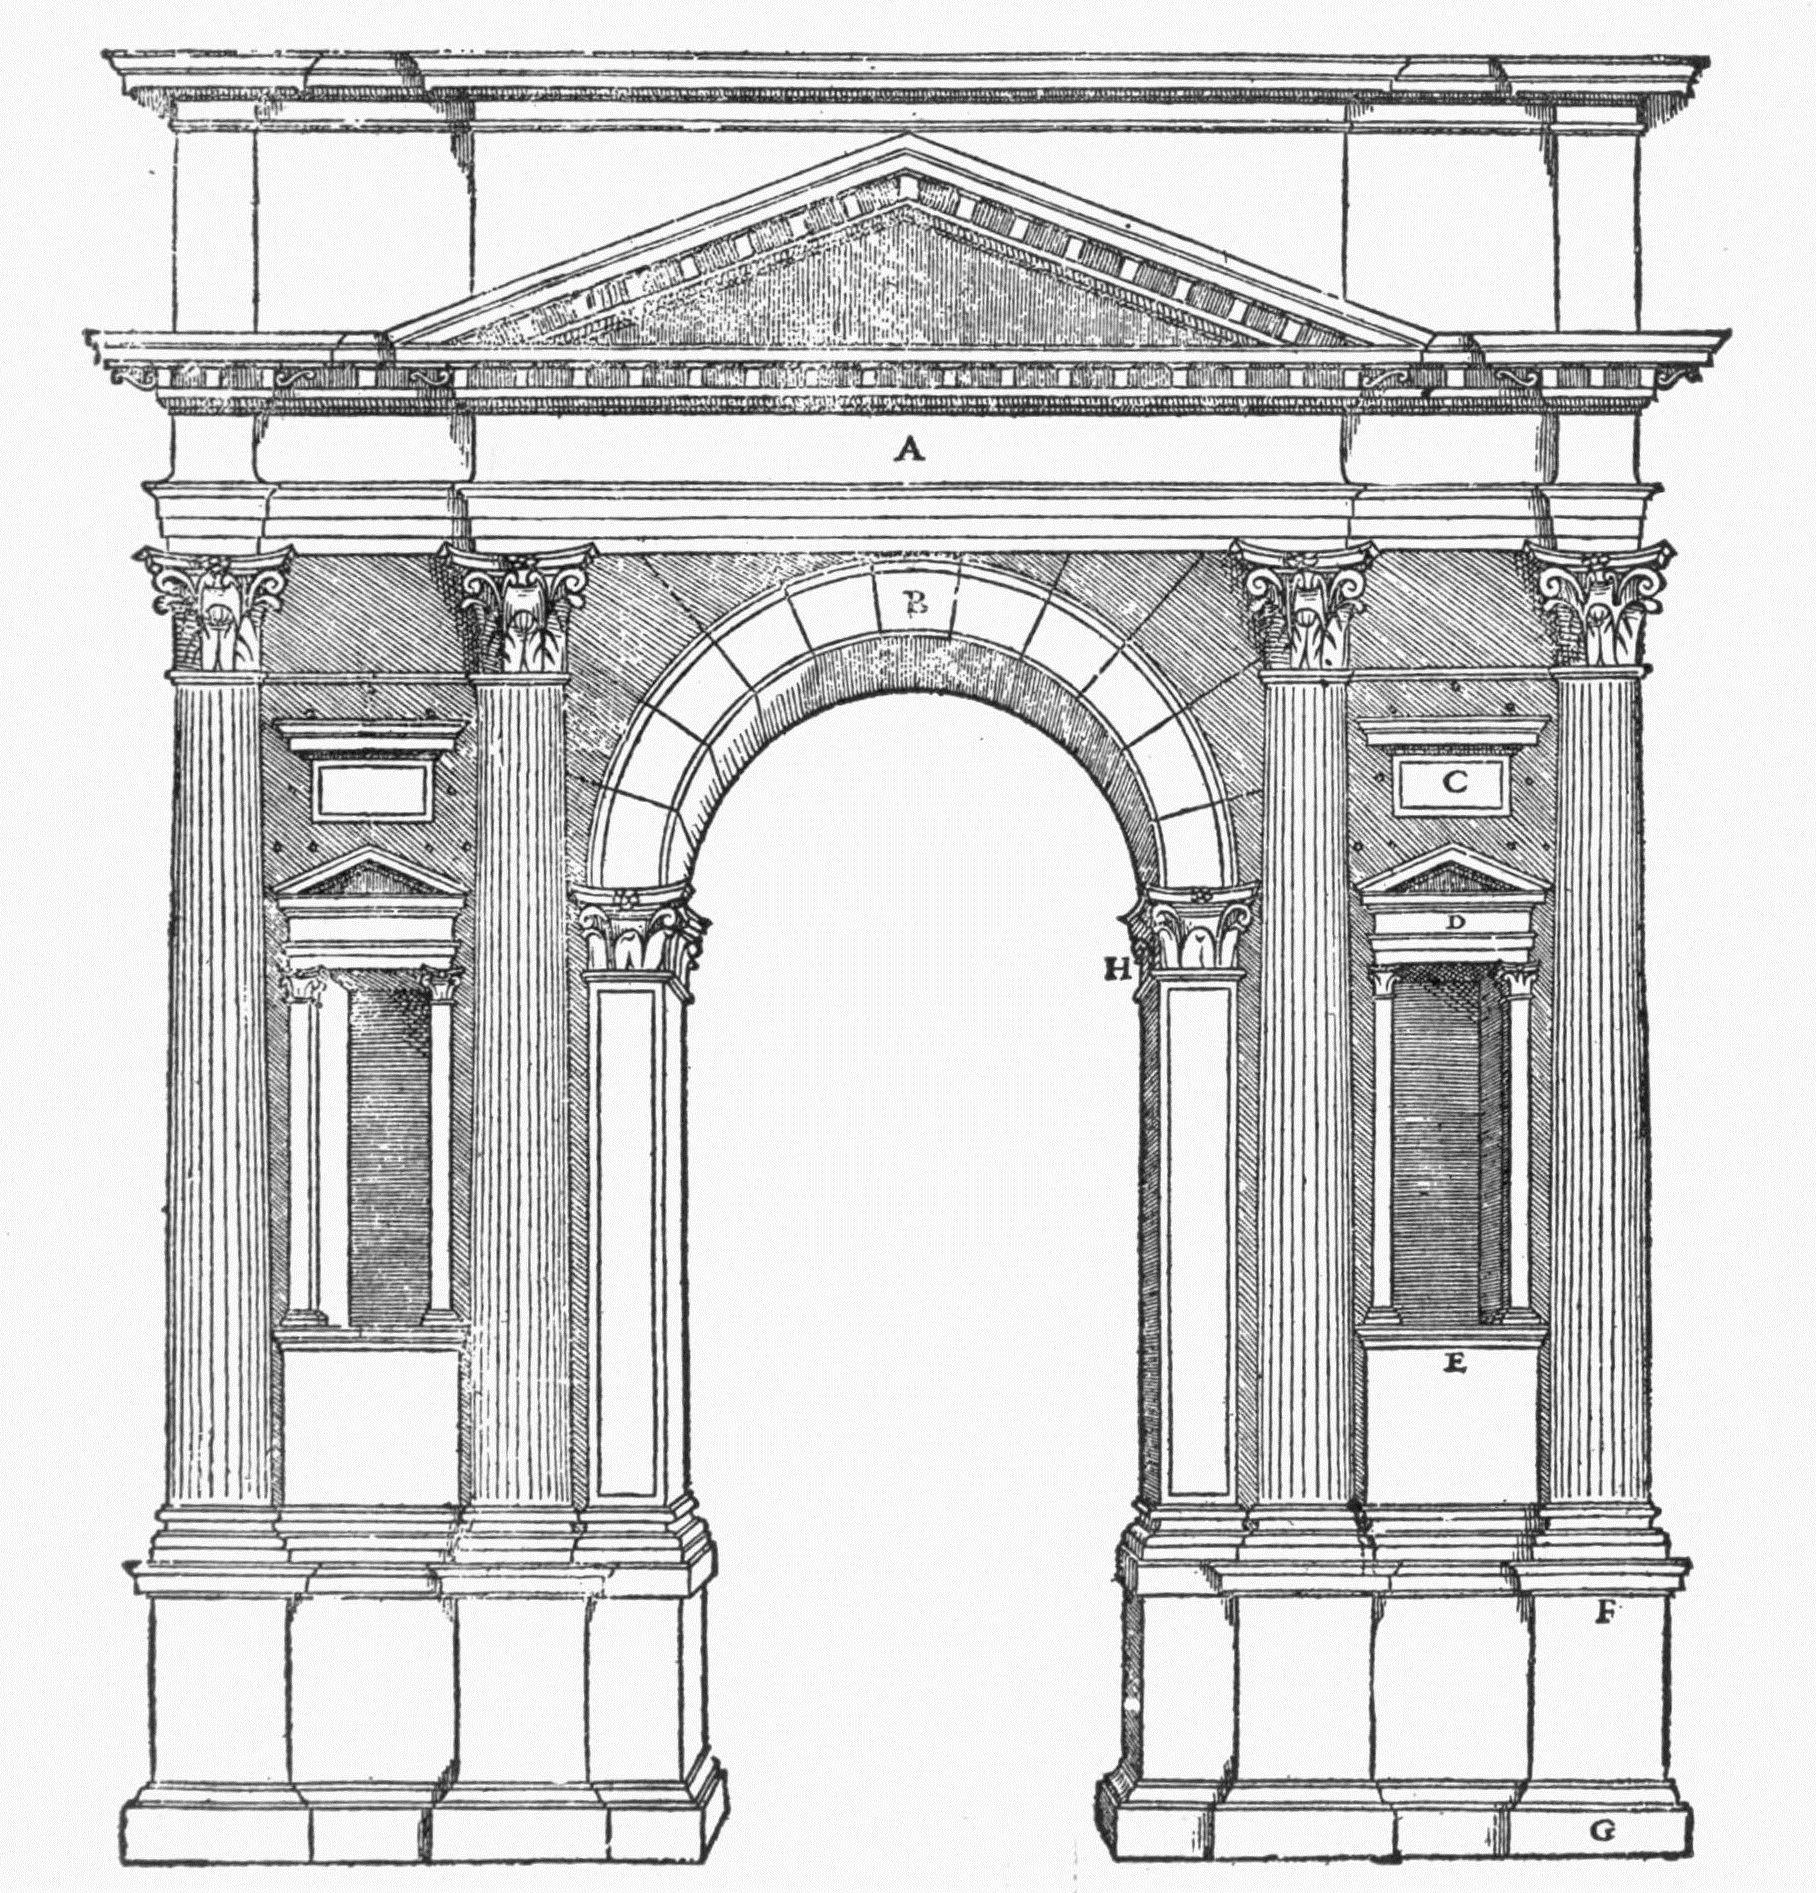 FileCharacter Of Renaissance Architecture 0239